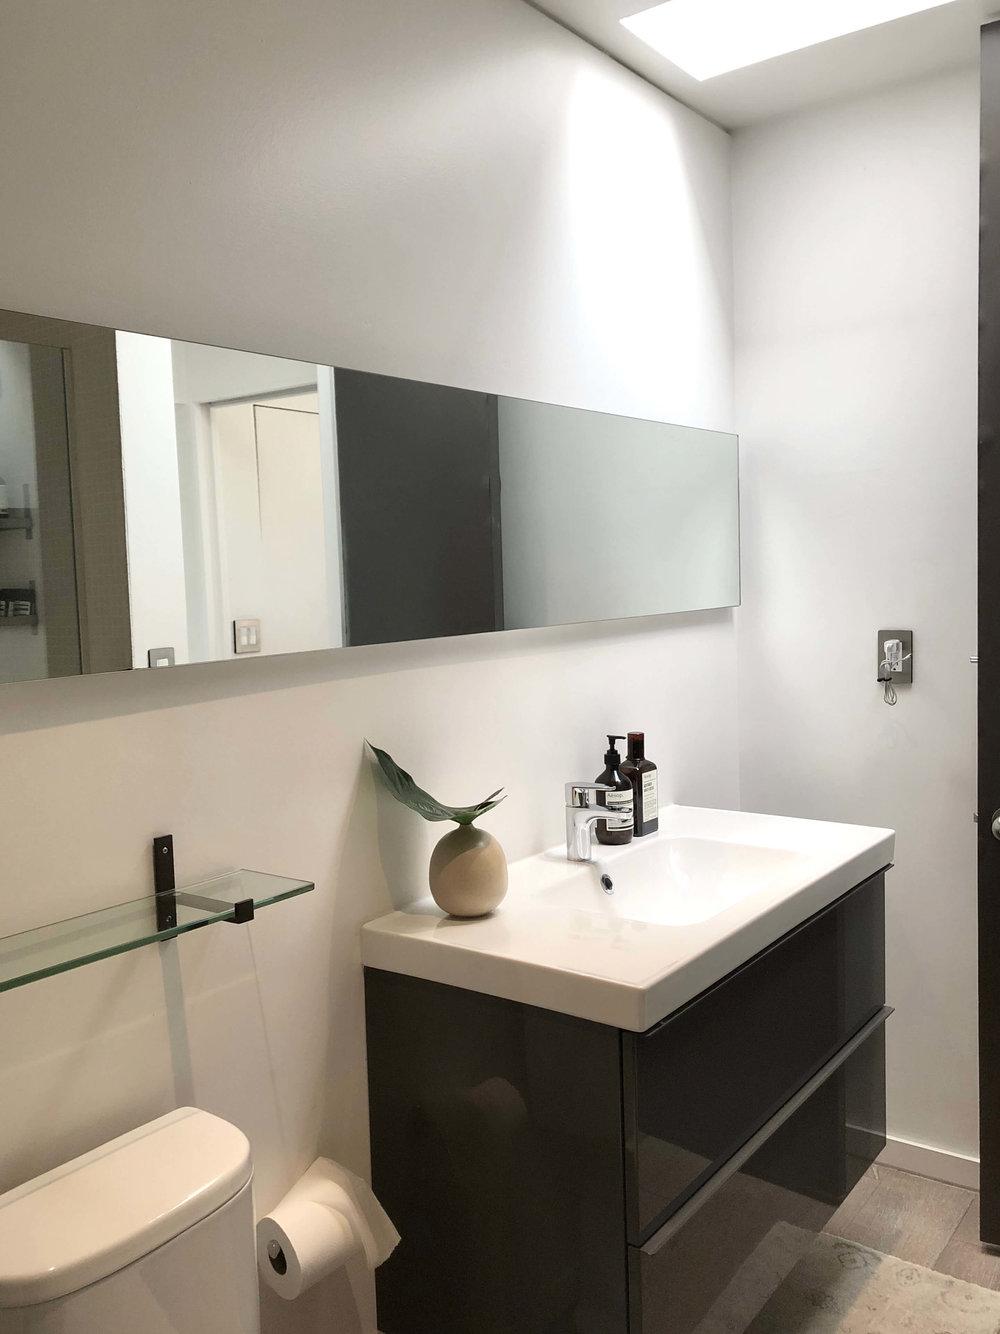 Modern bathroom with horizontal slab mirror and floating vanity #modernbathroom #mirror